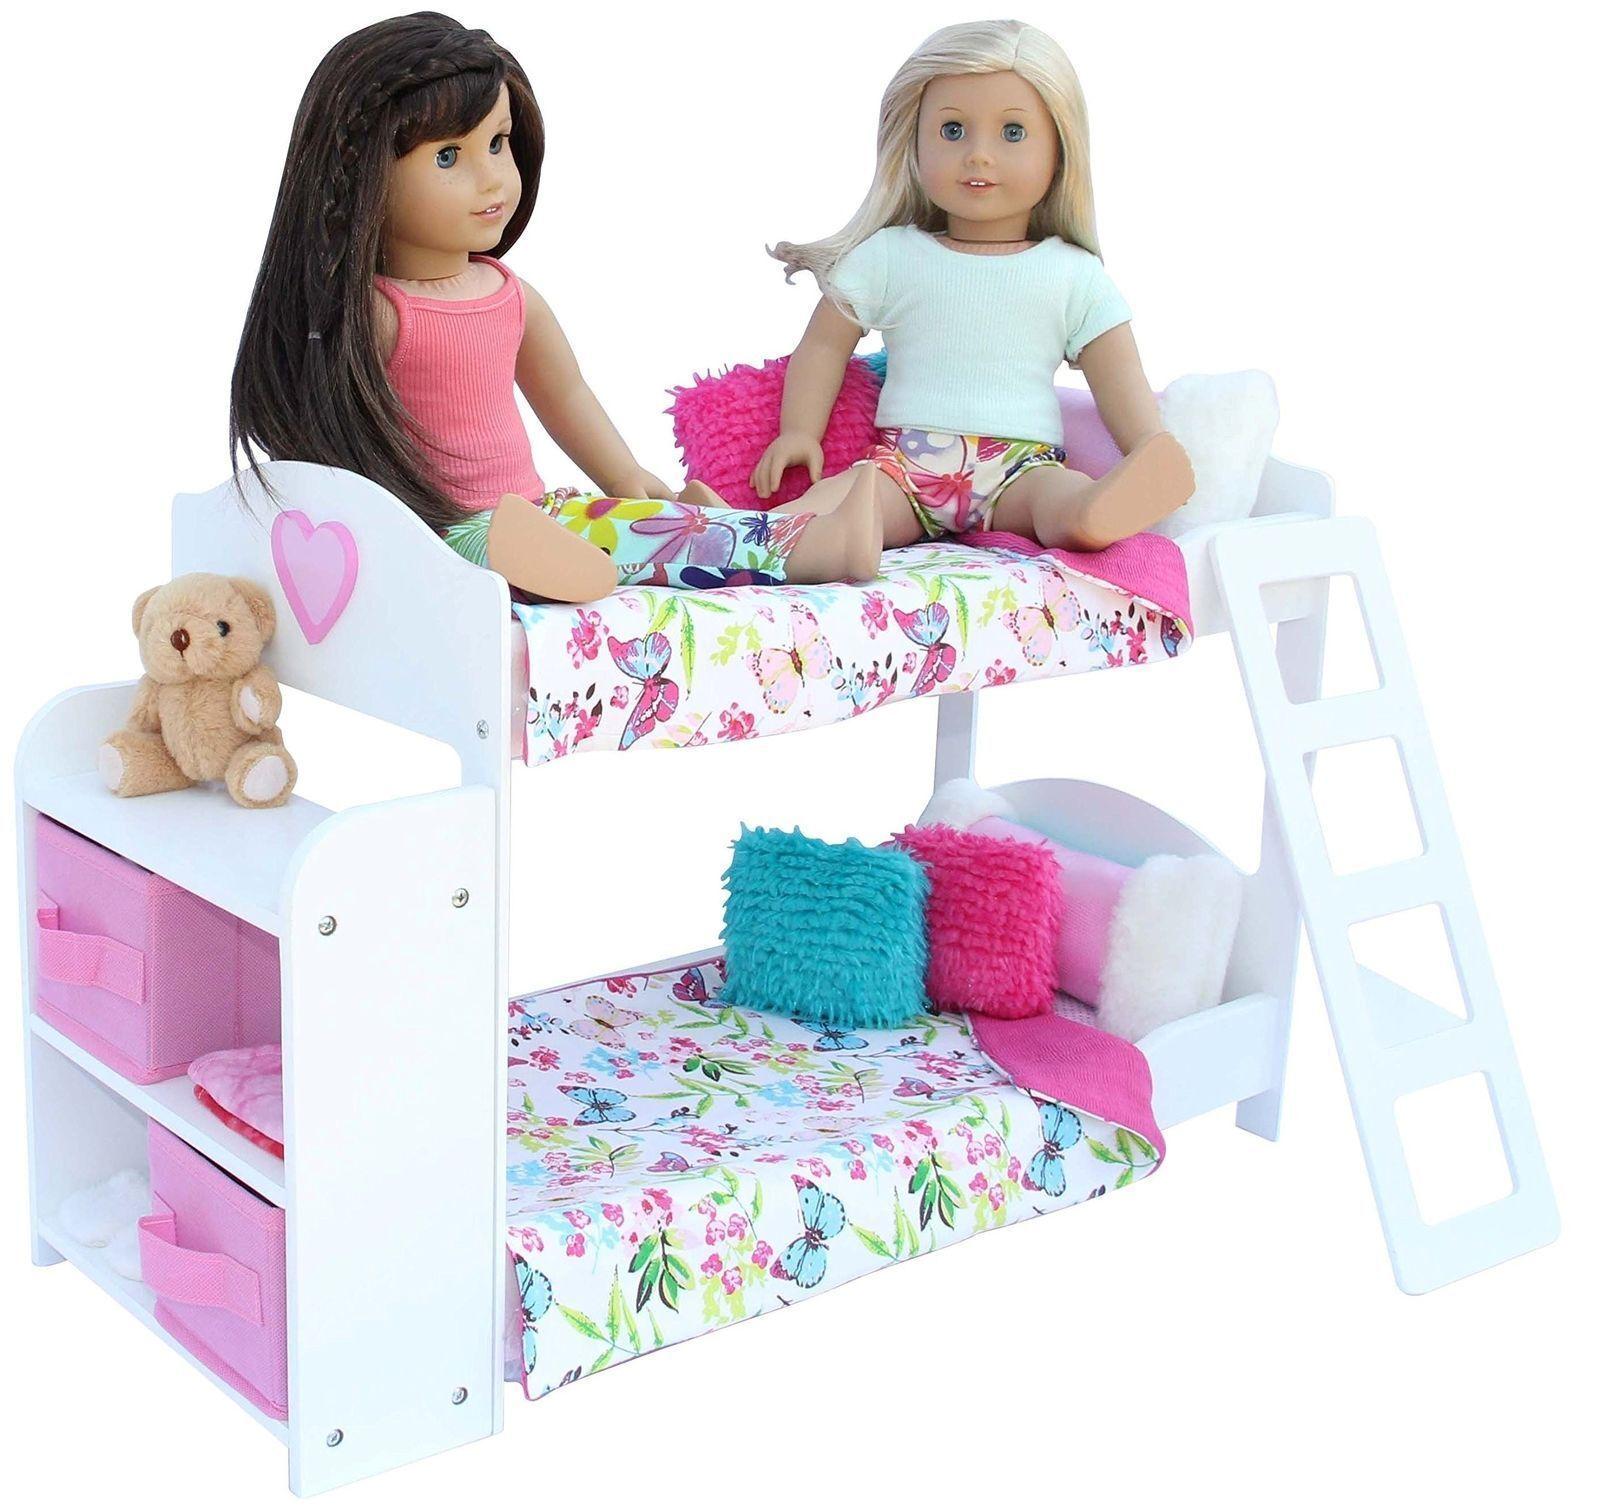 American Girl 20-Piece Bedroom Set for 18 Inch Doll | eBay